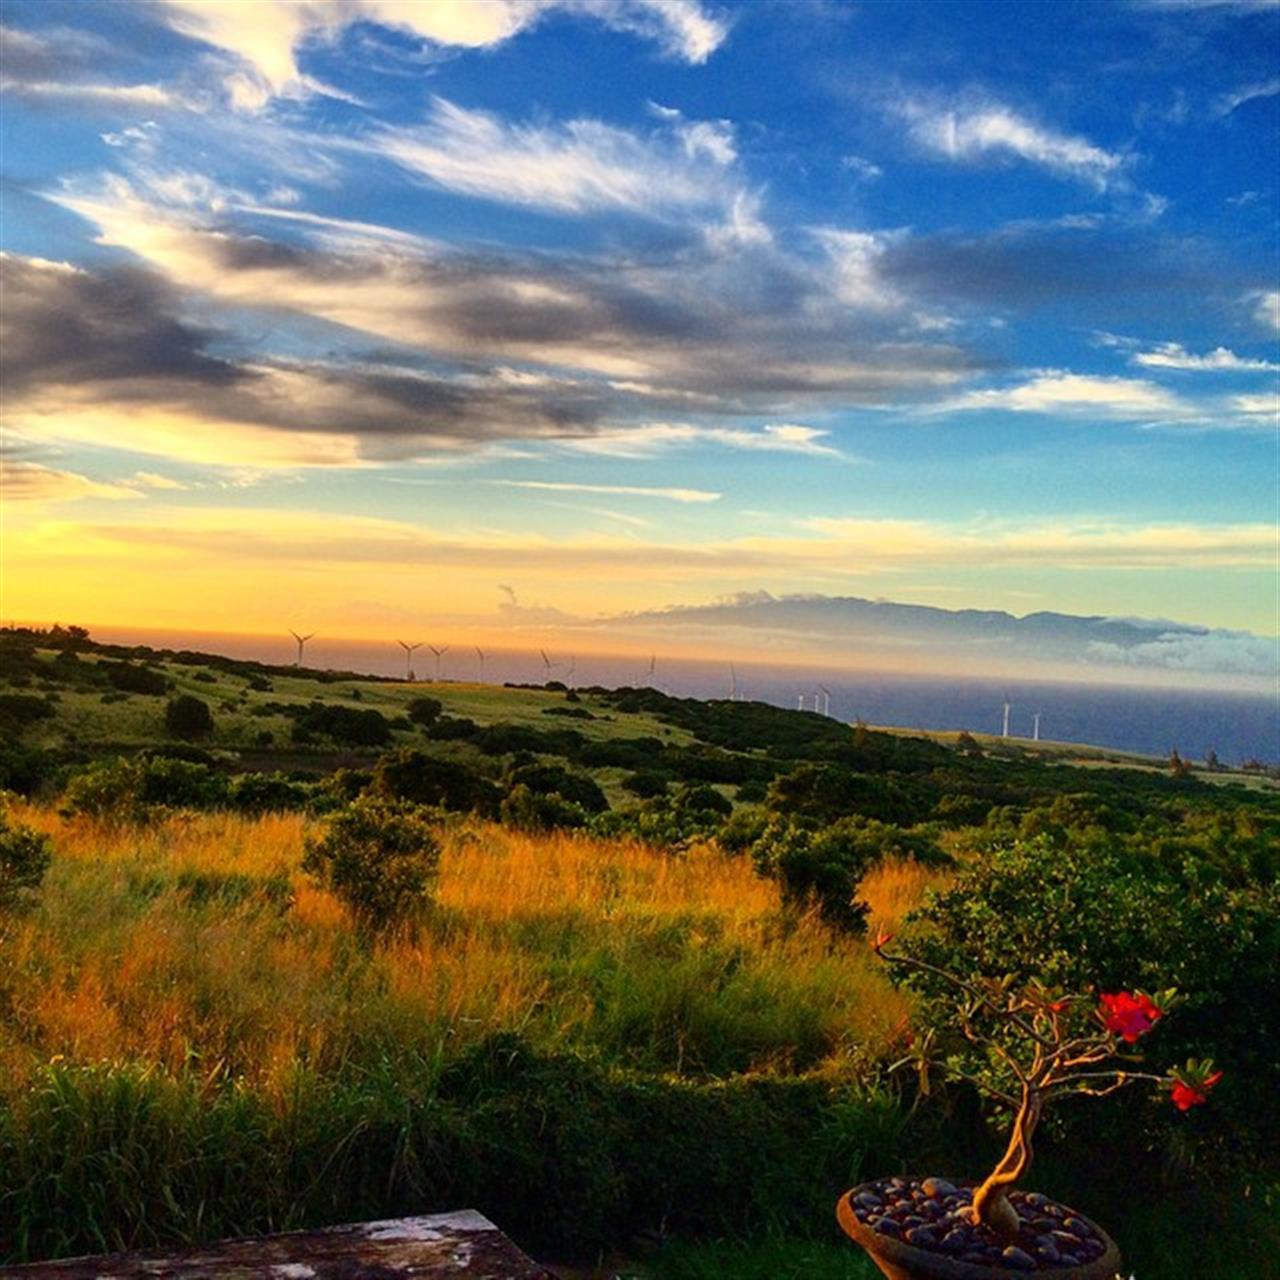 One thing about living on Moku o Keawe Hawai'i Island is that the sunsets never ever disappoint! ?#luckywelivehawaii #derbyfarm #beingbrooke #hawaiilife #365hawaiisunset #hnnsunrise #glimpseofhawaii #leadingRElocal